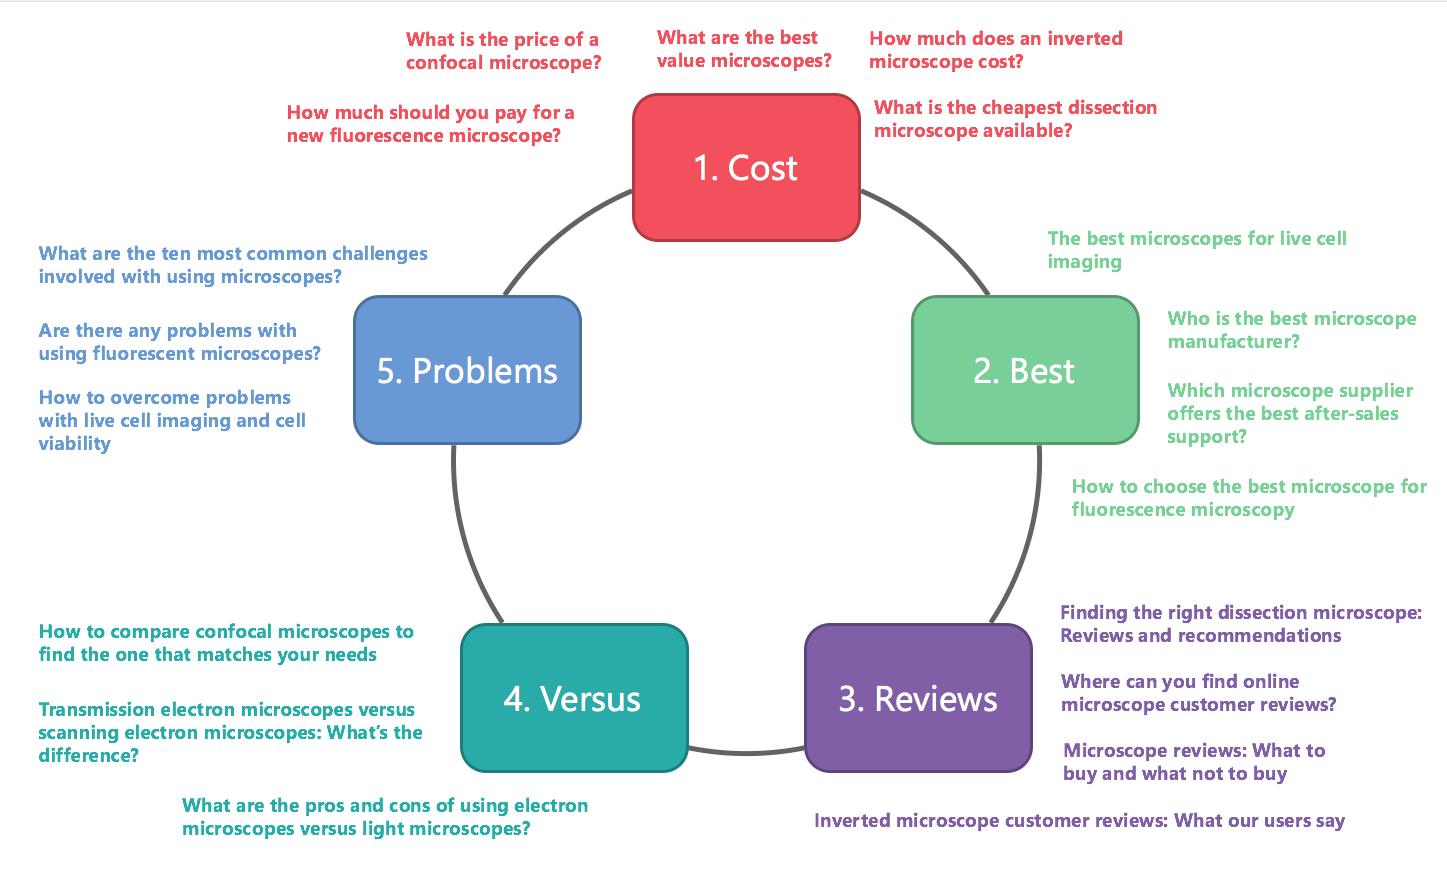 Microscope blog ideas using the Content Matrix Template